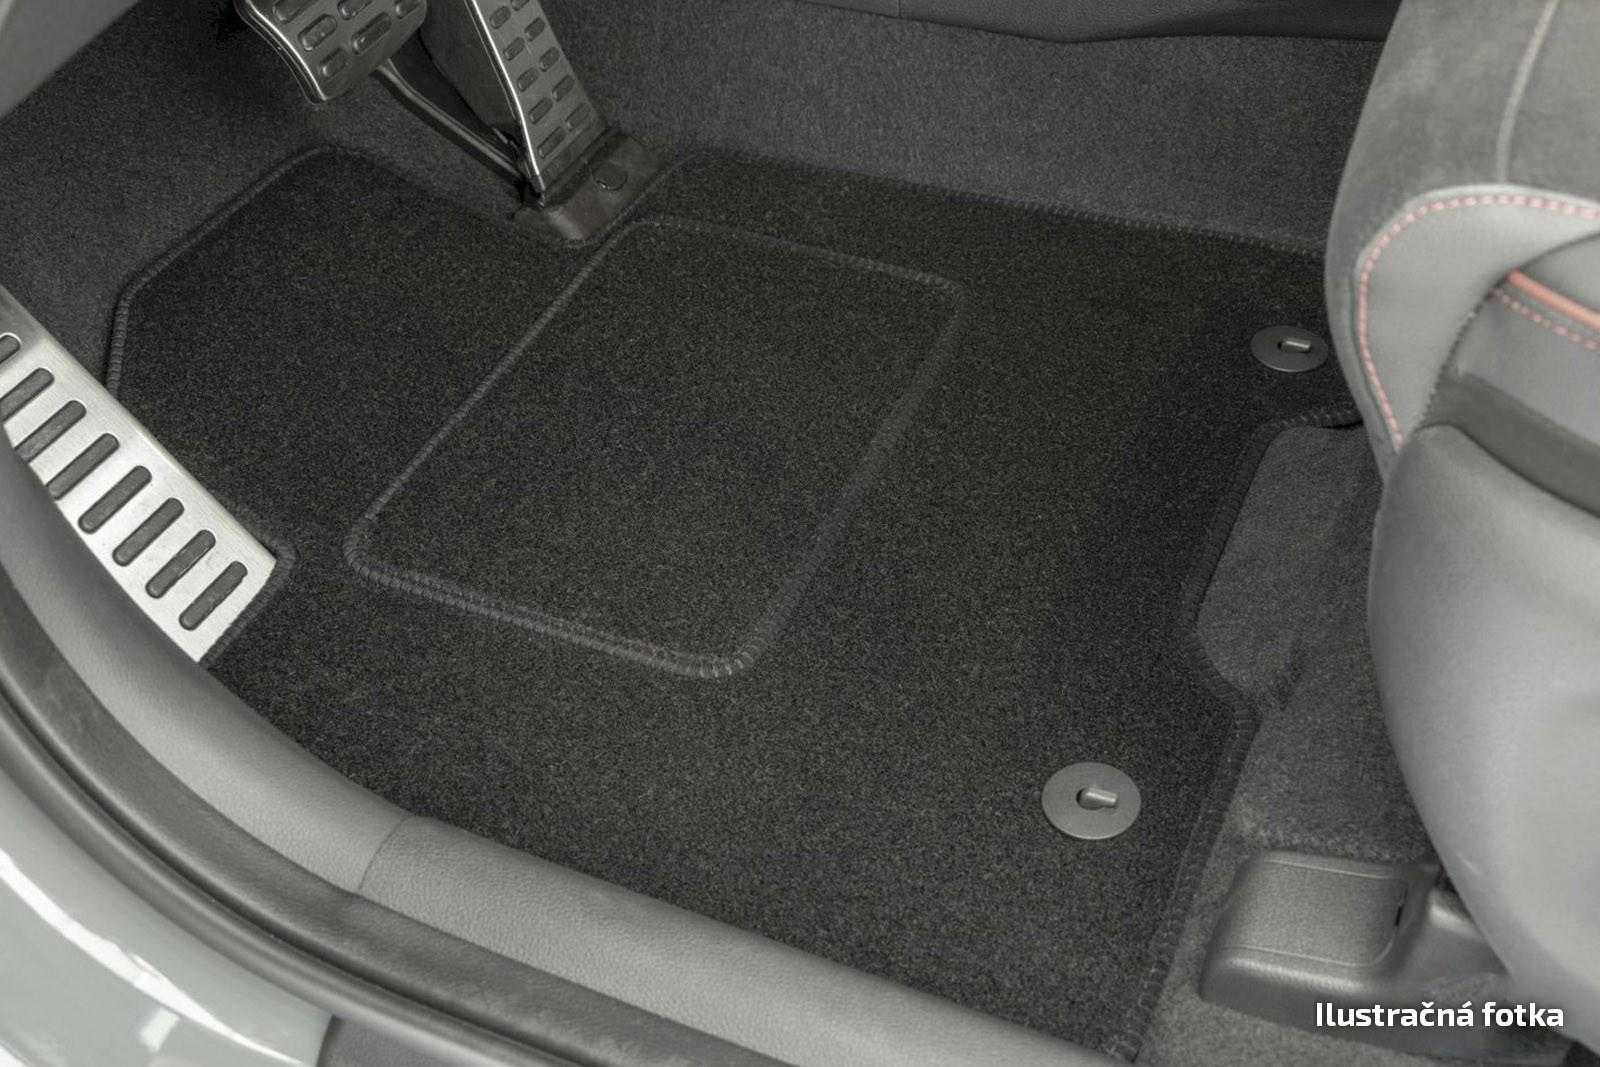 Poza cu Covorase din velur, Nissan Micra, 2003-2009